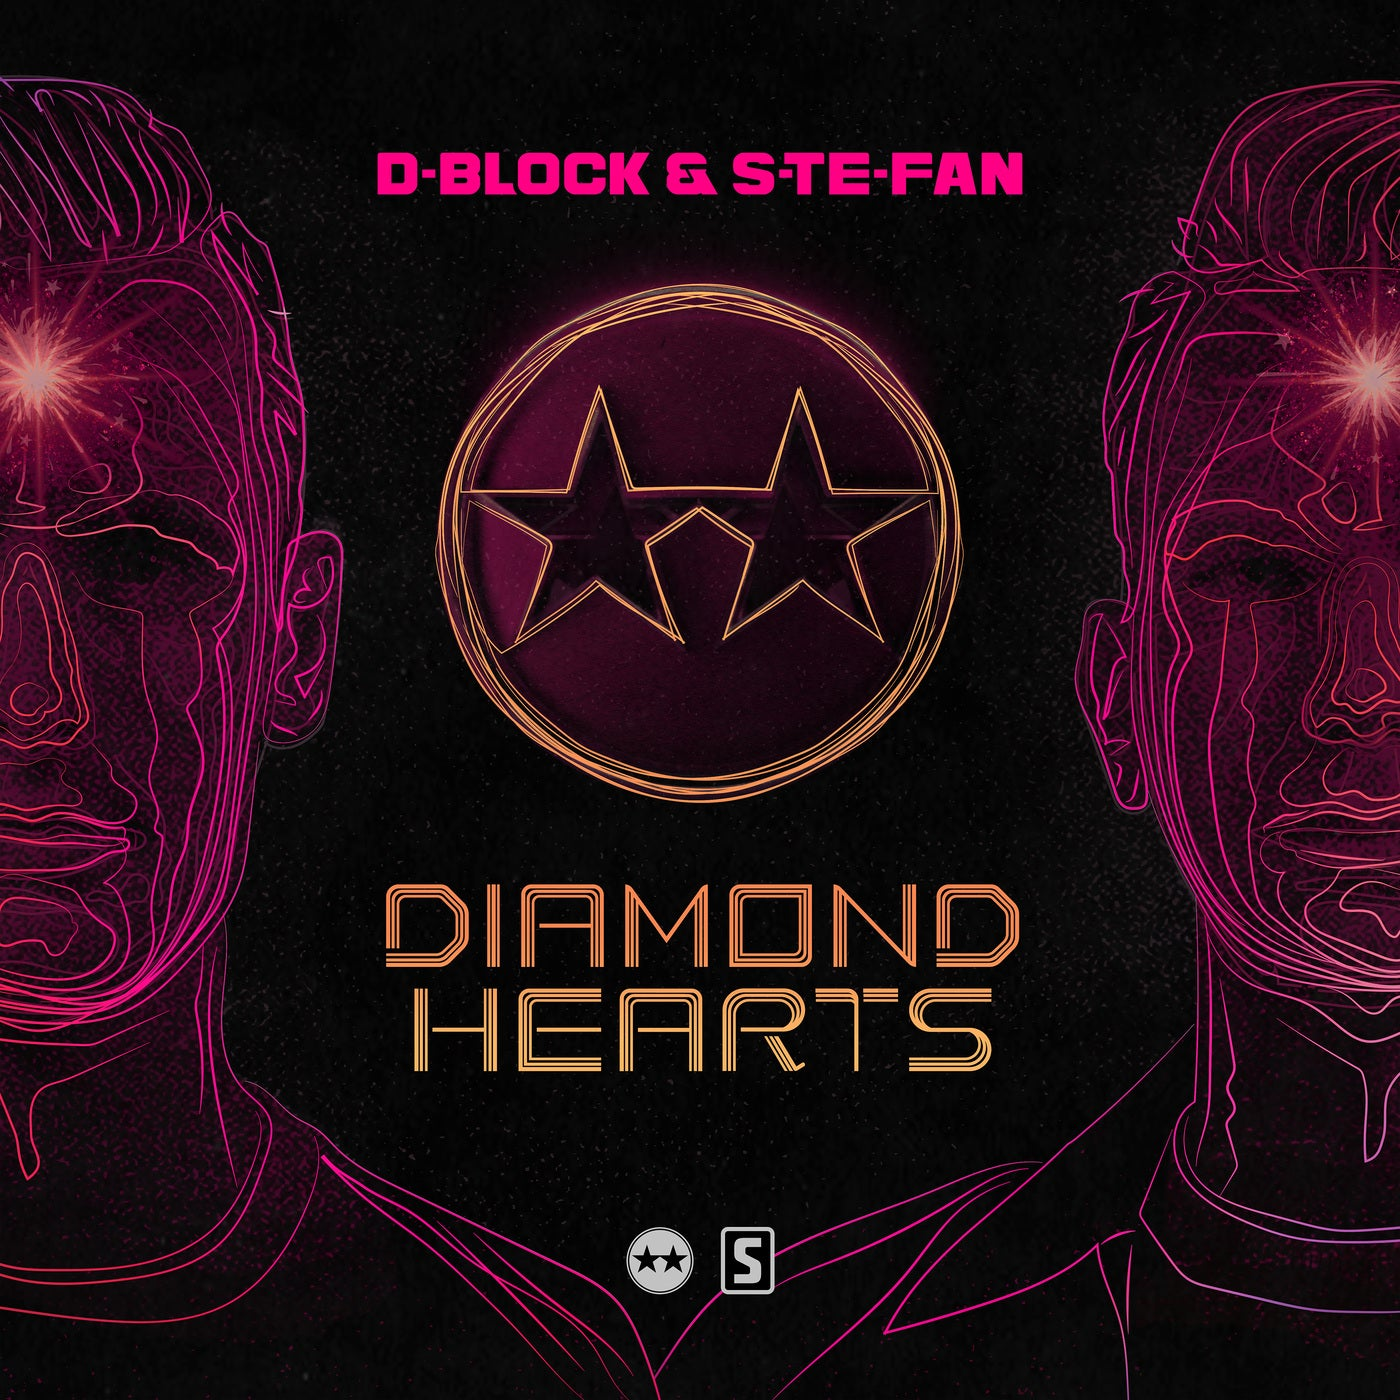 Diamond Hearts (Original Mix)